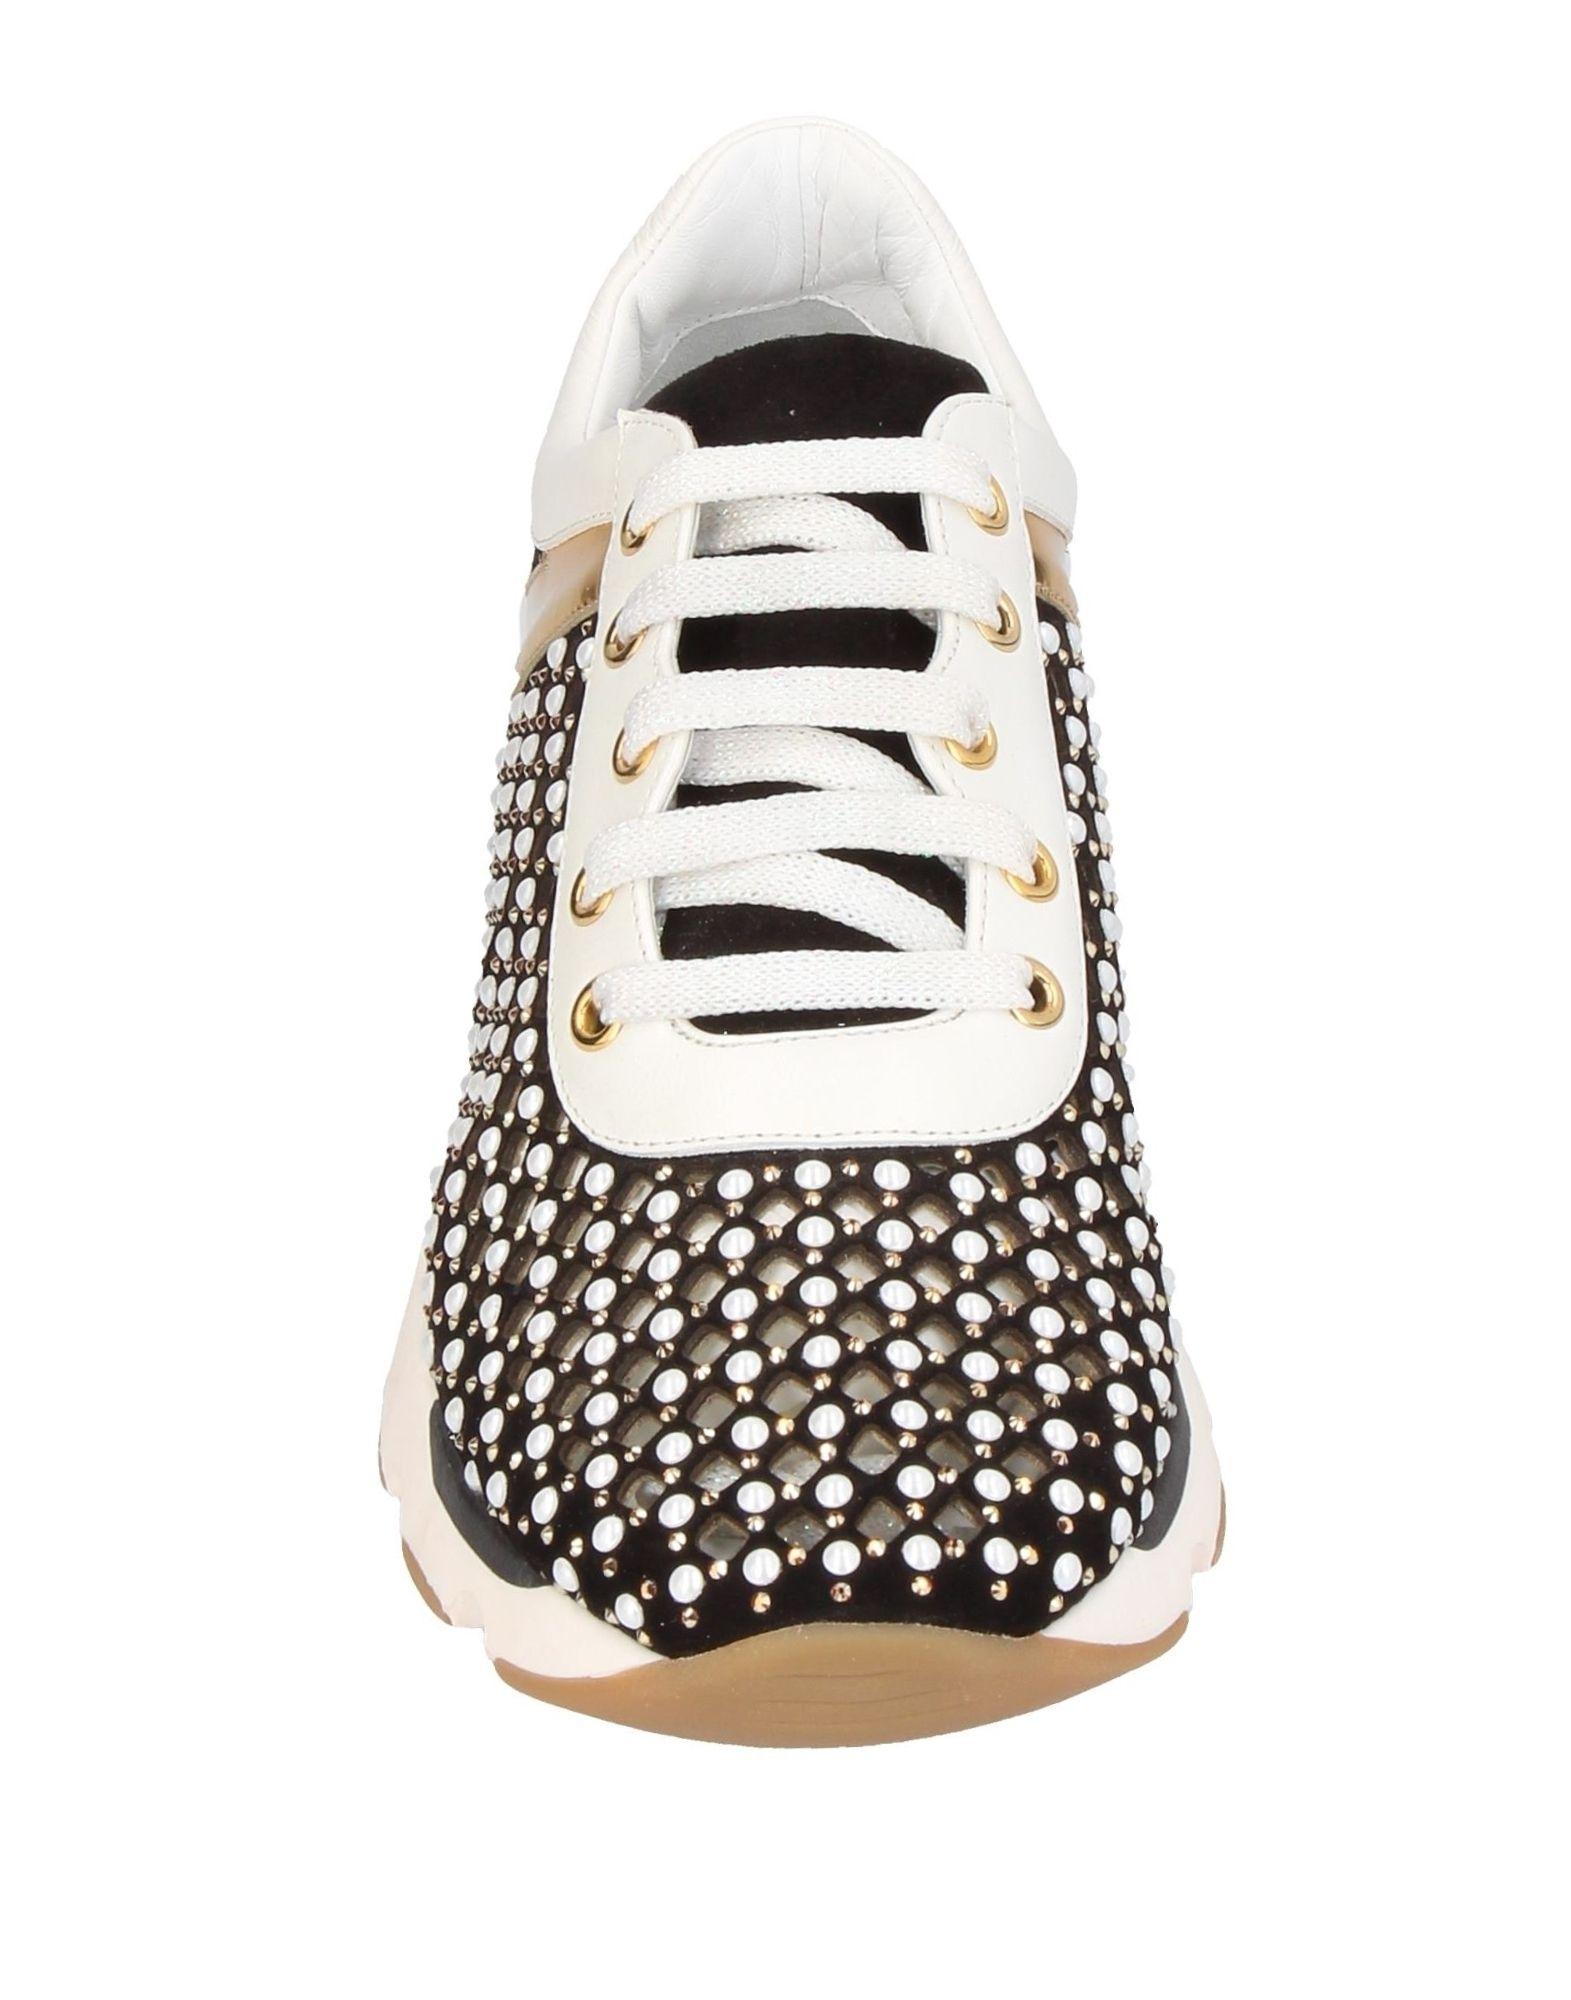 Sneakers Rene Caovilla Femme - Sneakers Rene Caovilla sur ...